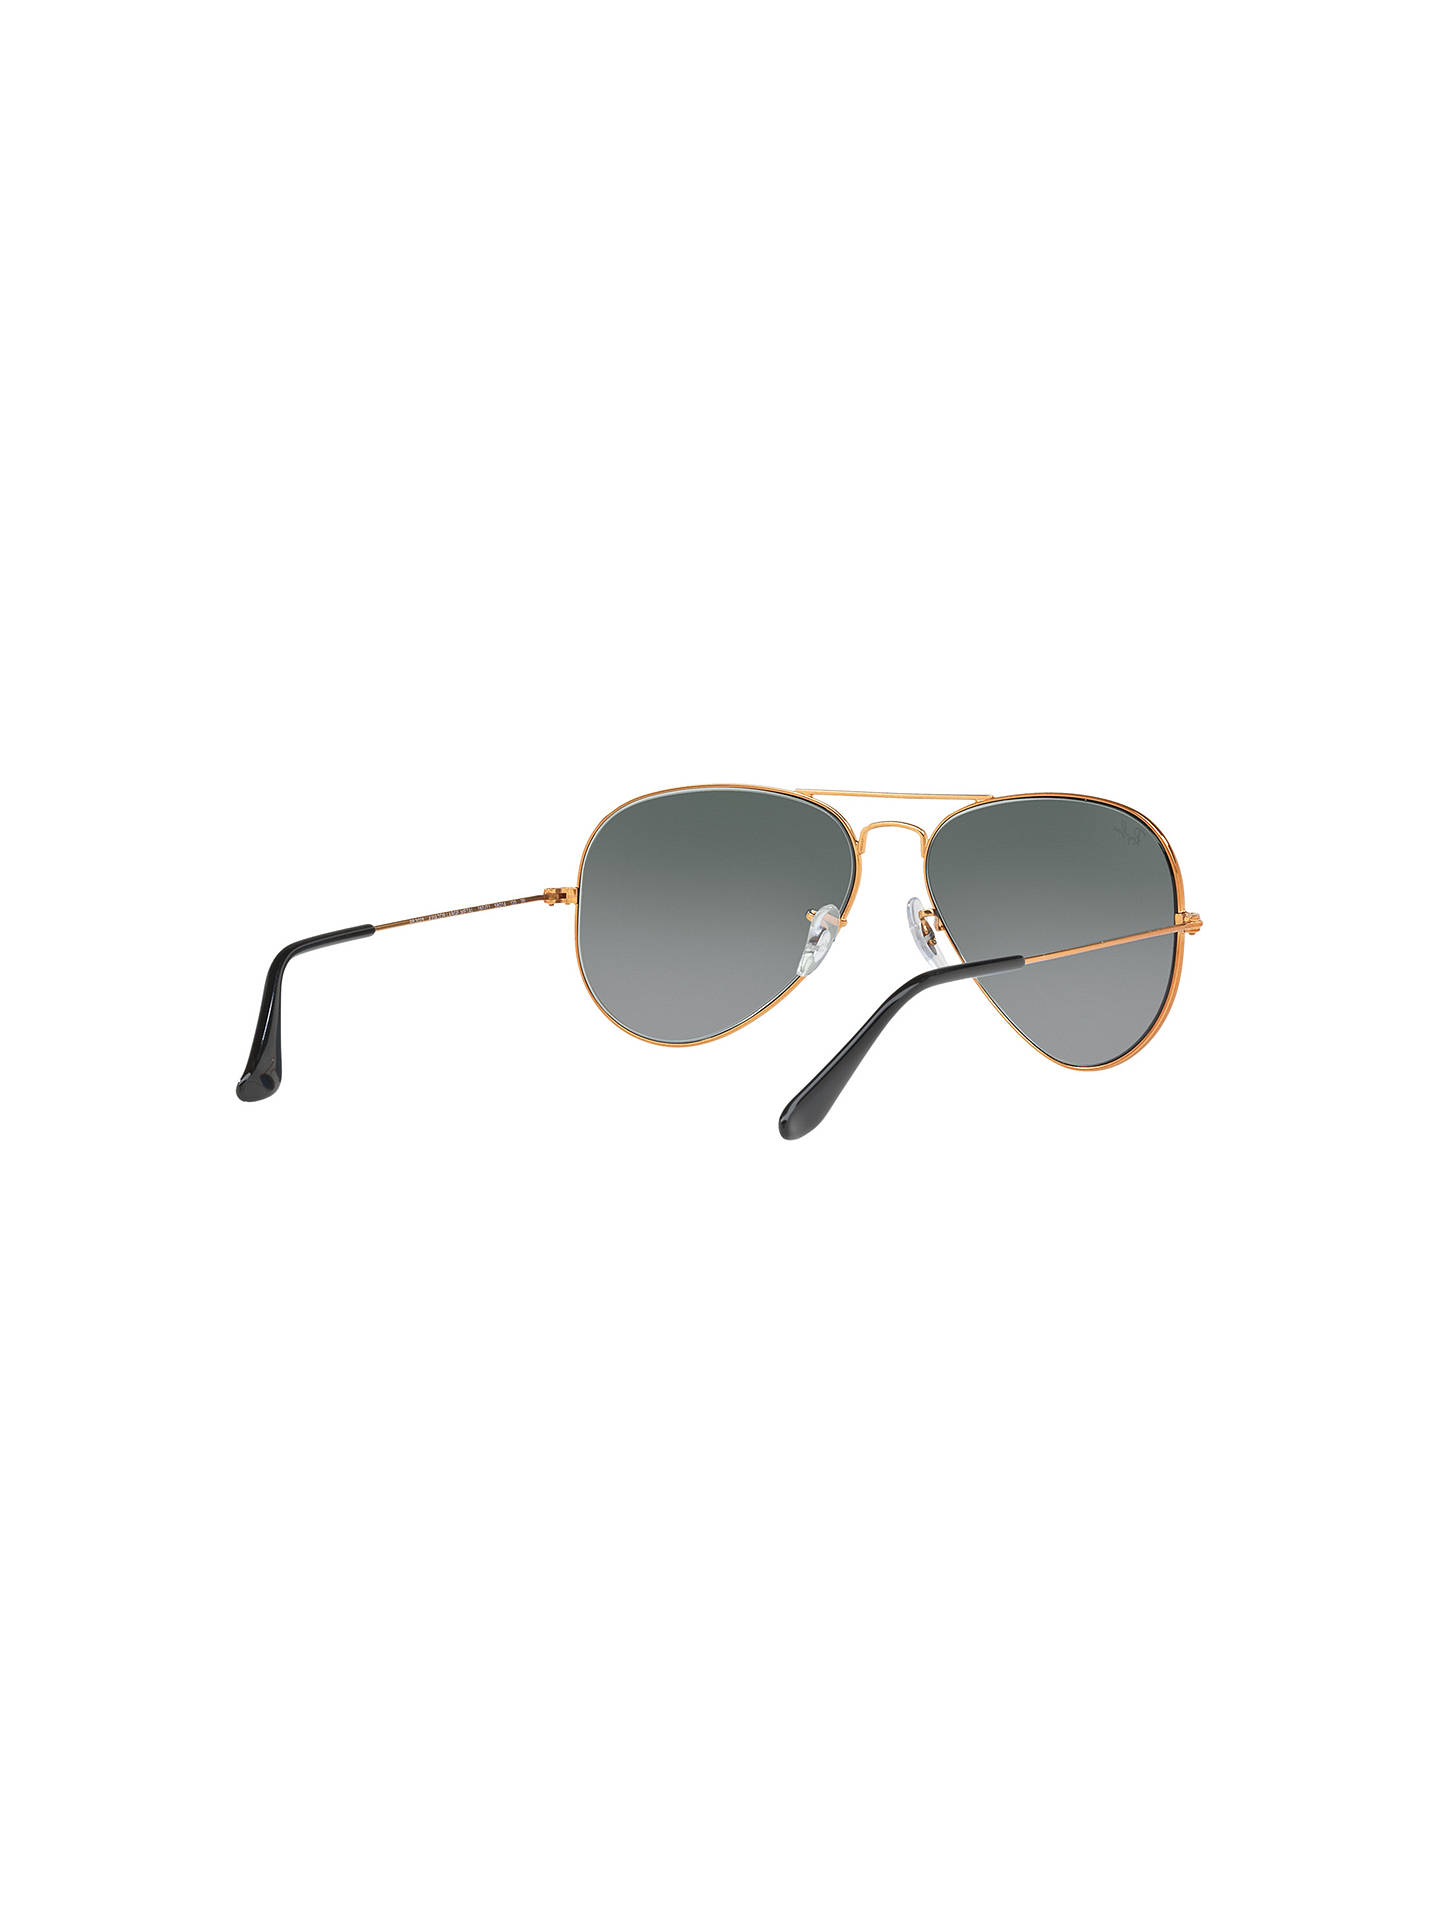 6627db45c22f9 Ray-Ban RB3025 Aviator Sunglasses at John Lewis   Partners